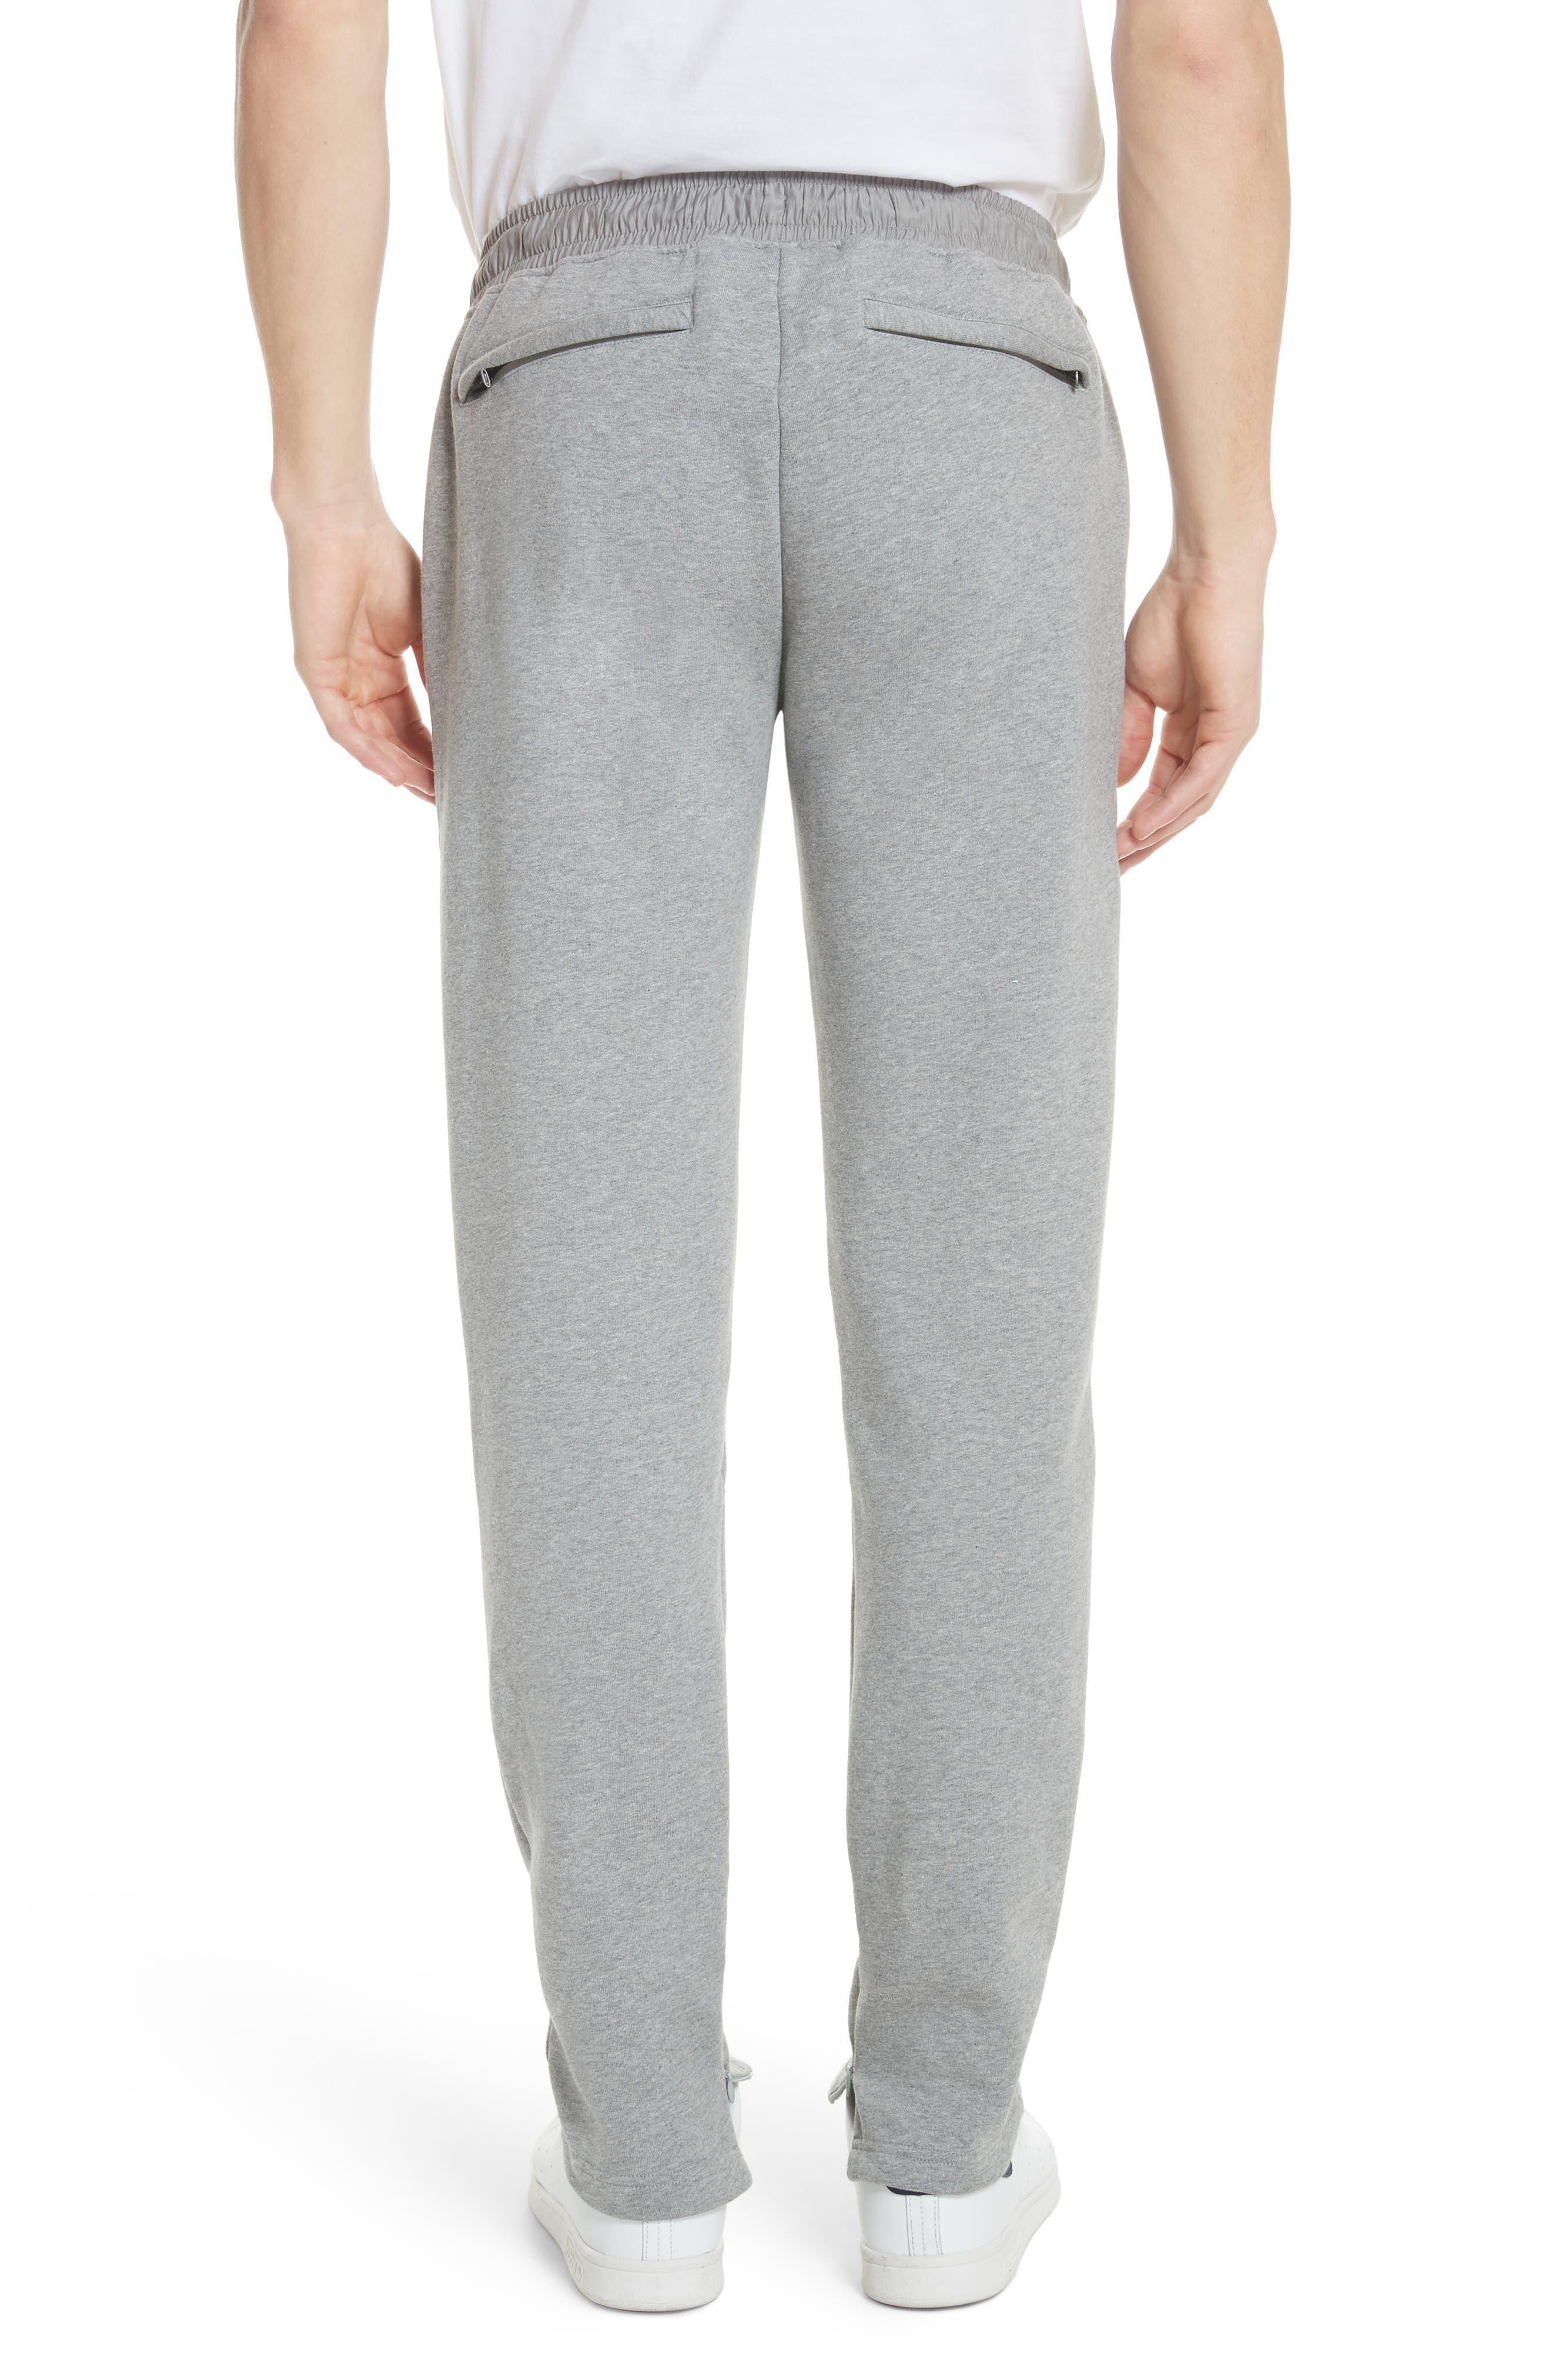 Nickford Lounge Pants,                             Alternate thumbnail 2, color,                             Pale Grey Melange